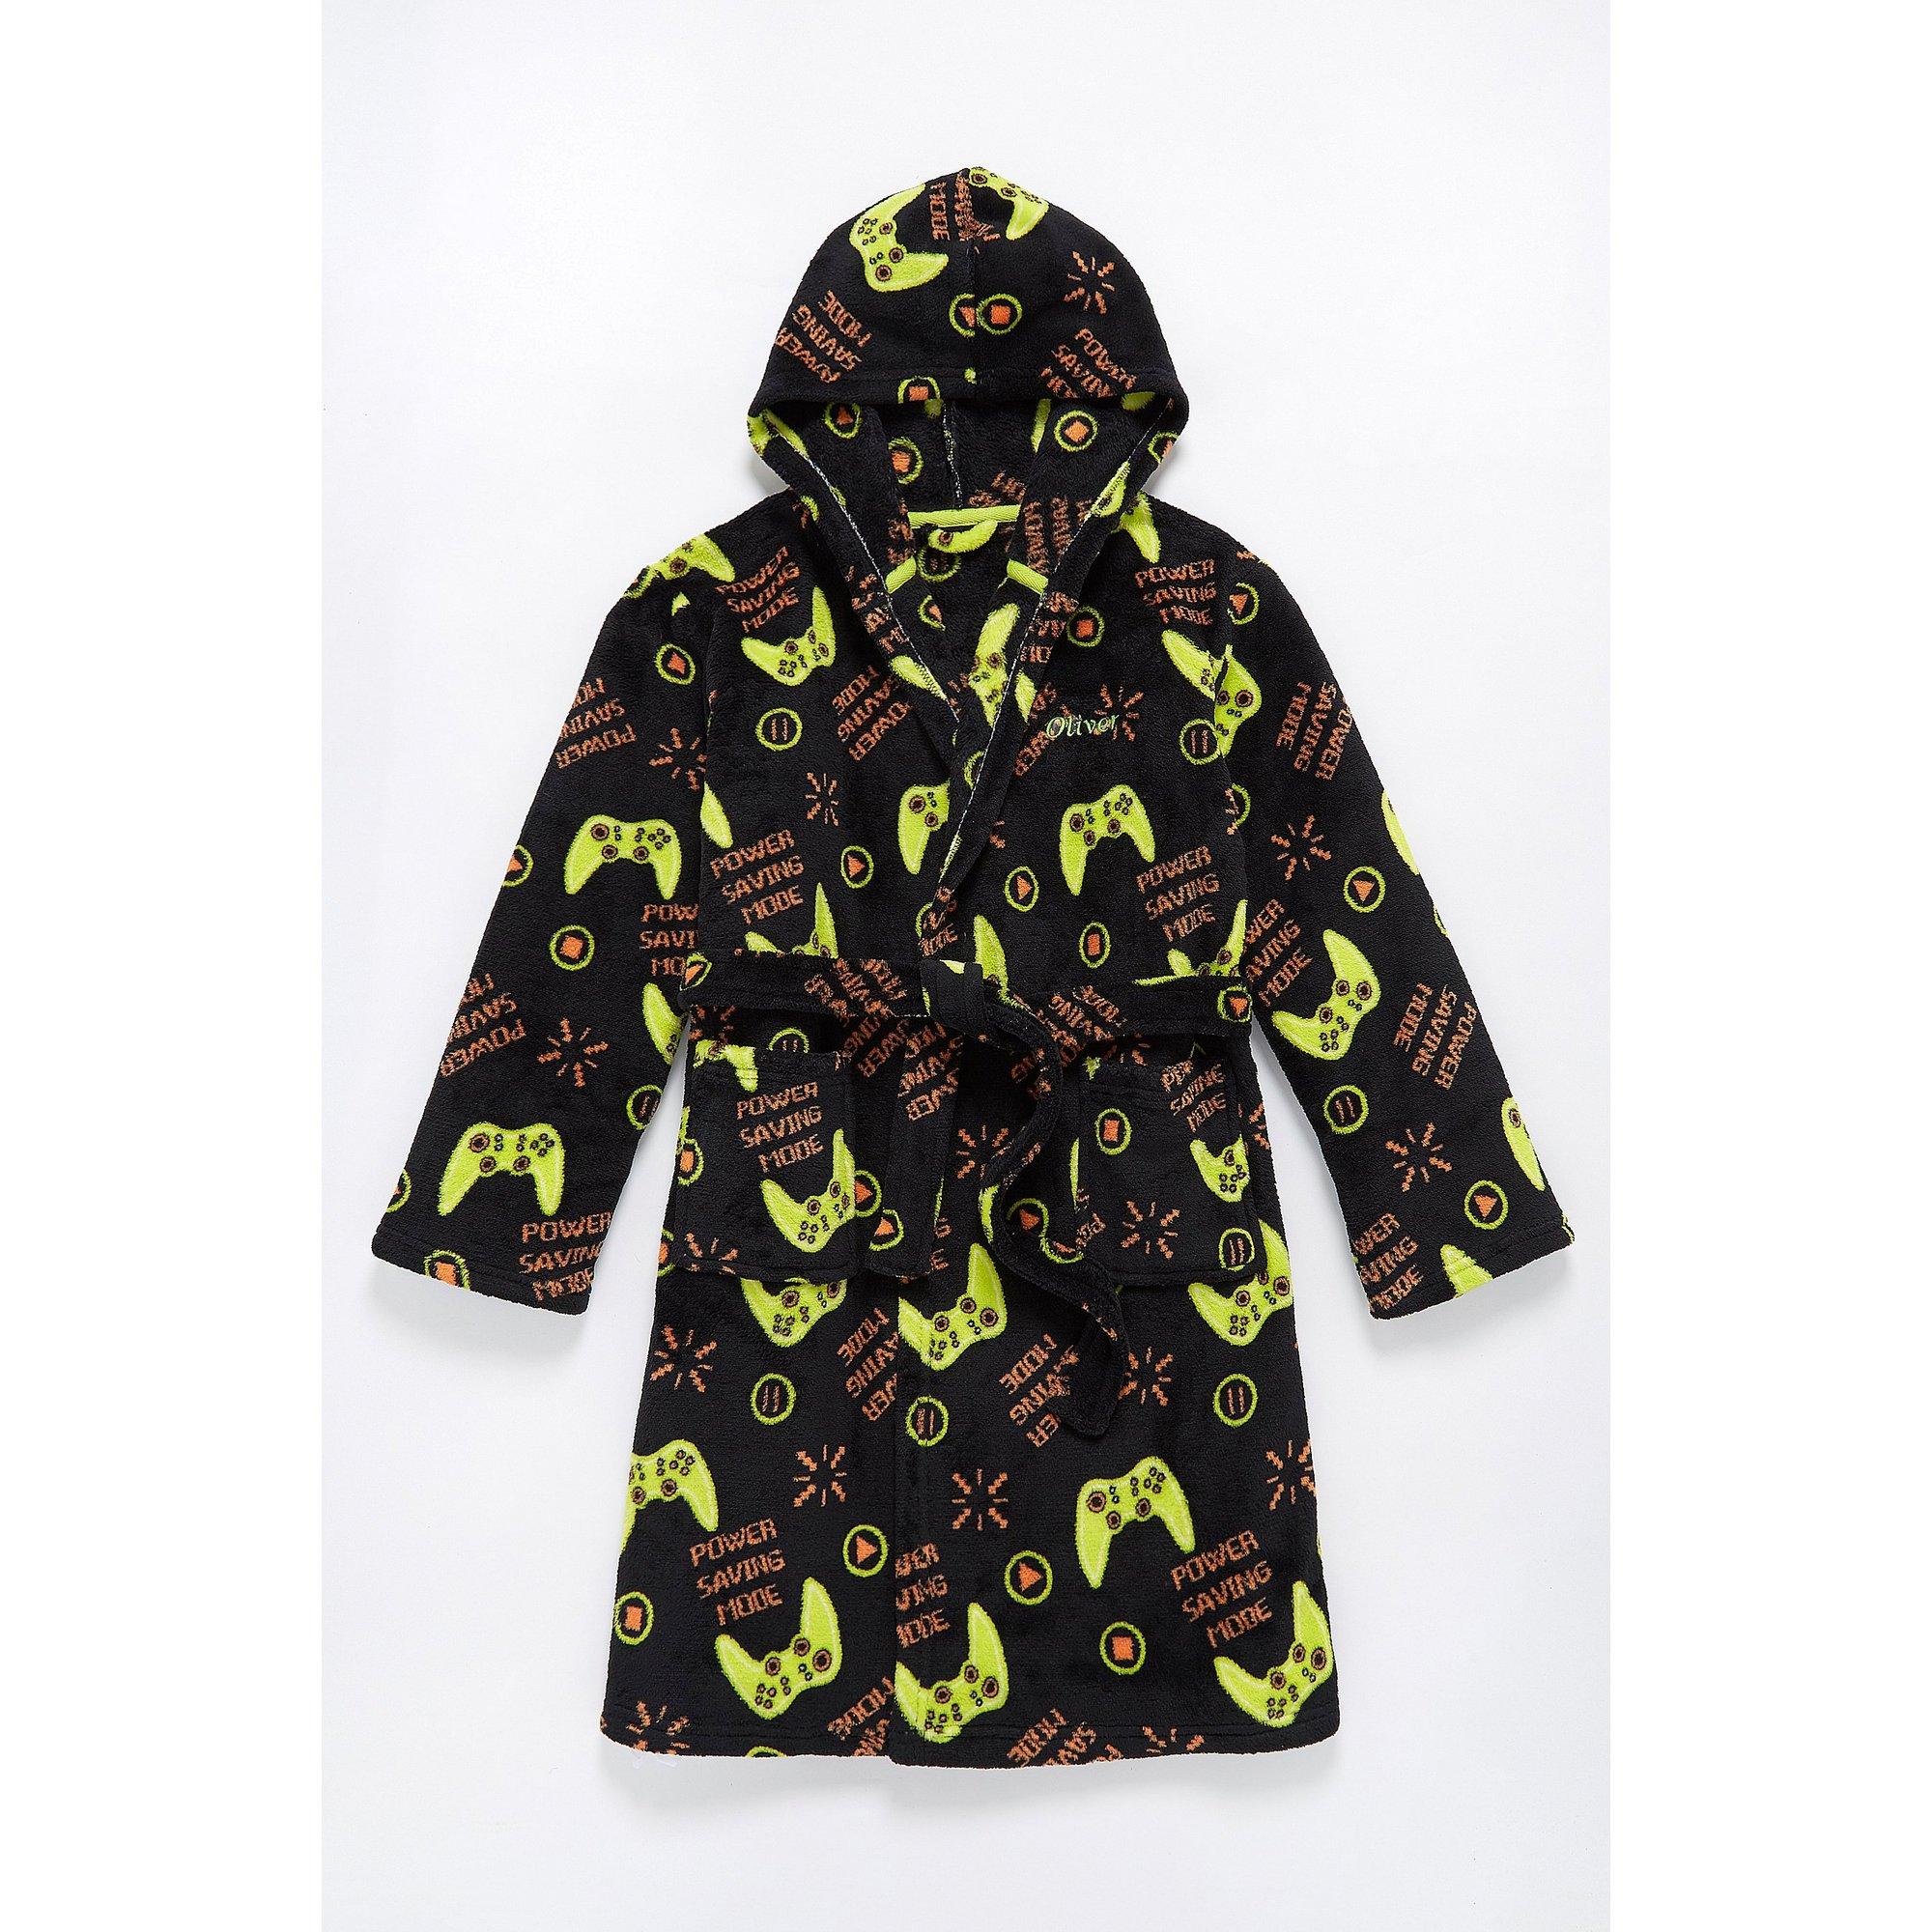 Image of Boys Personalised Gaming Robe